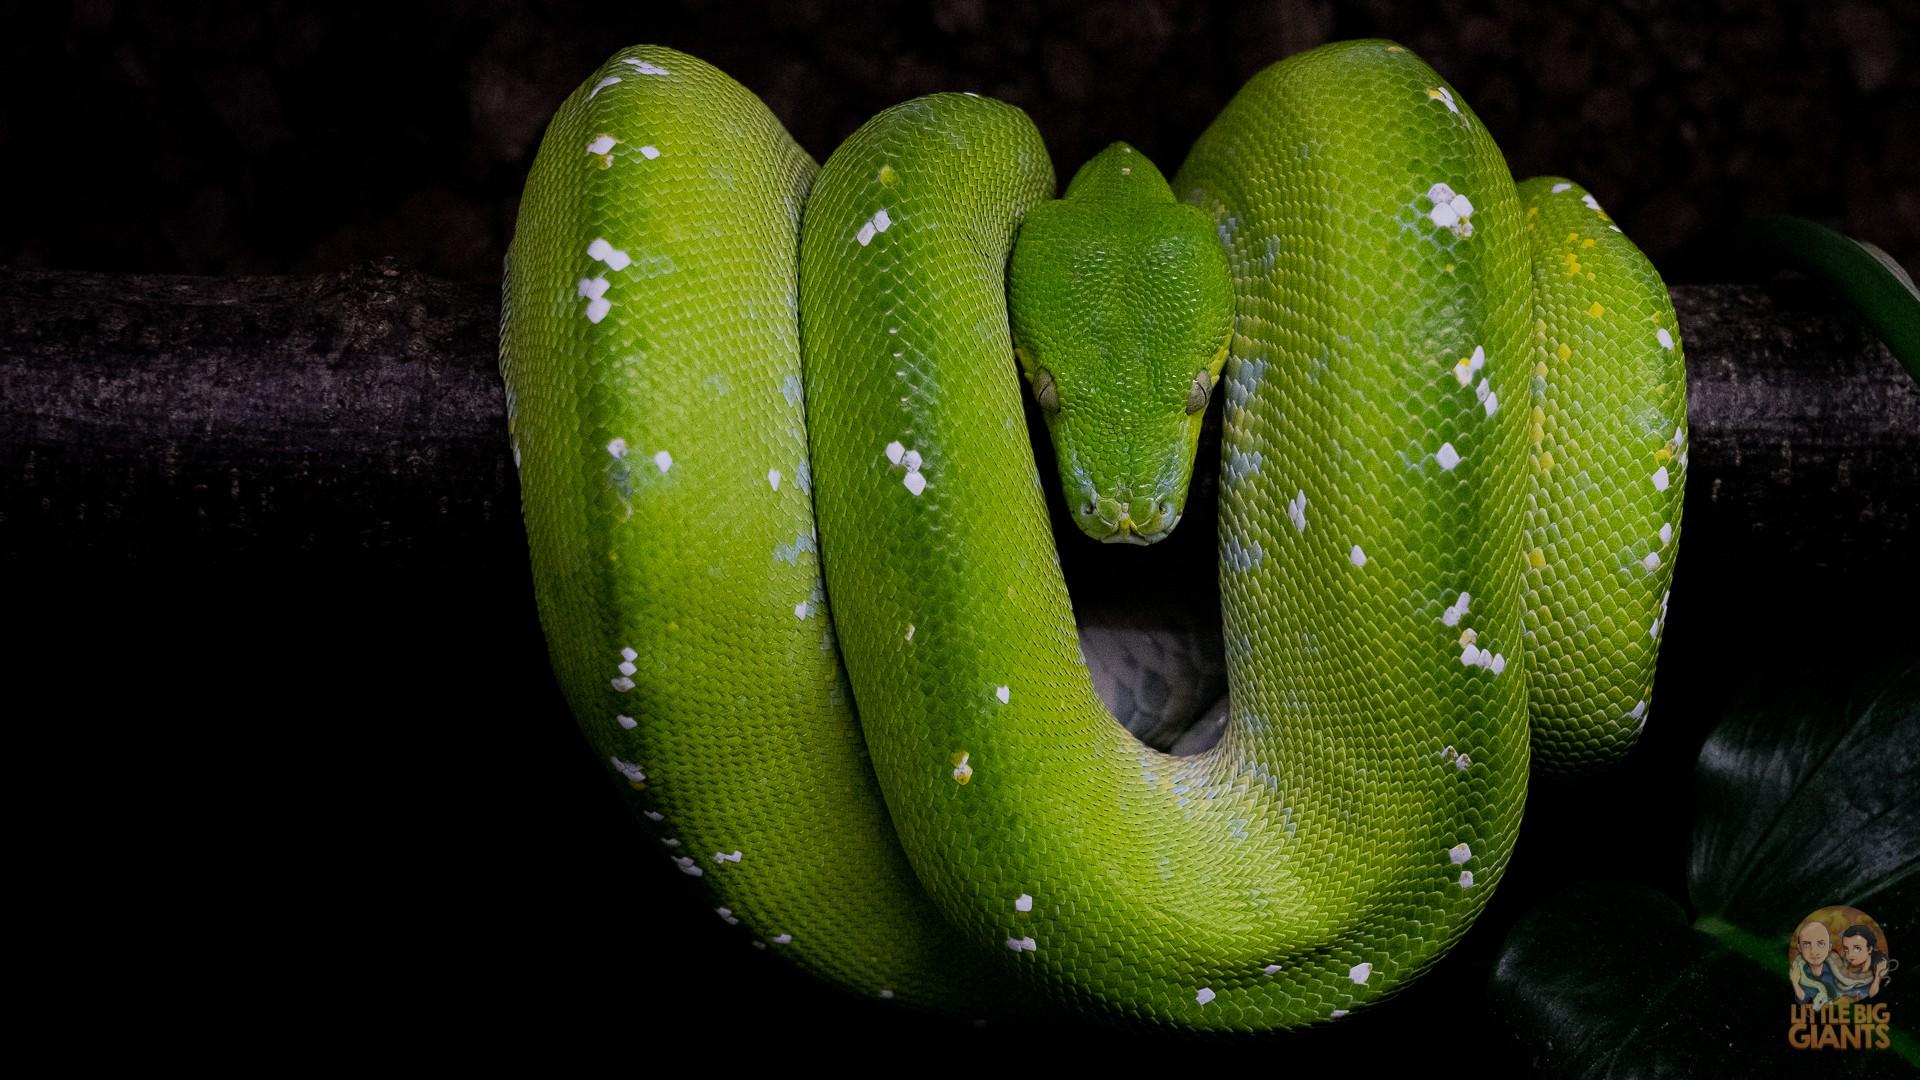 1.0 Morelia viridis